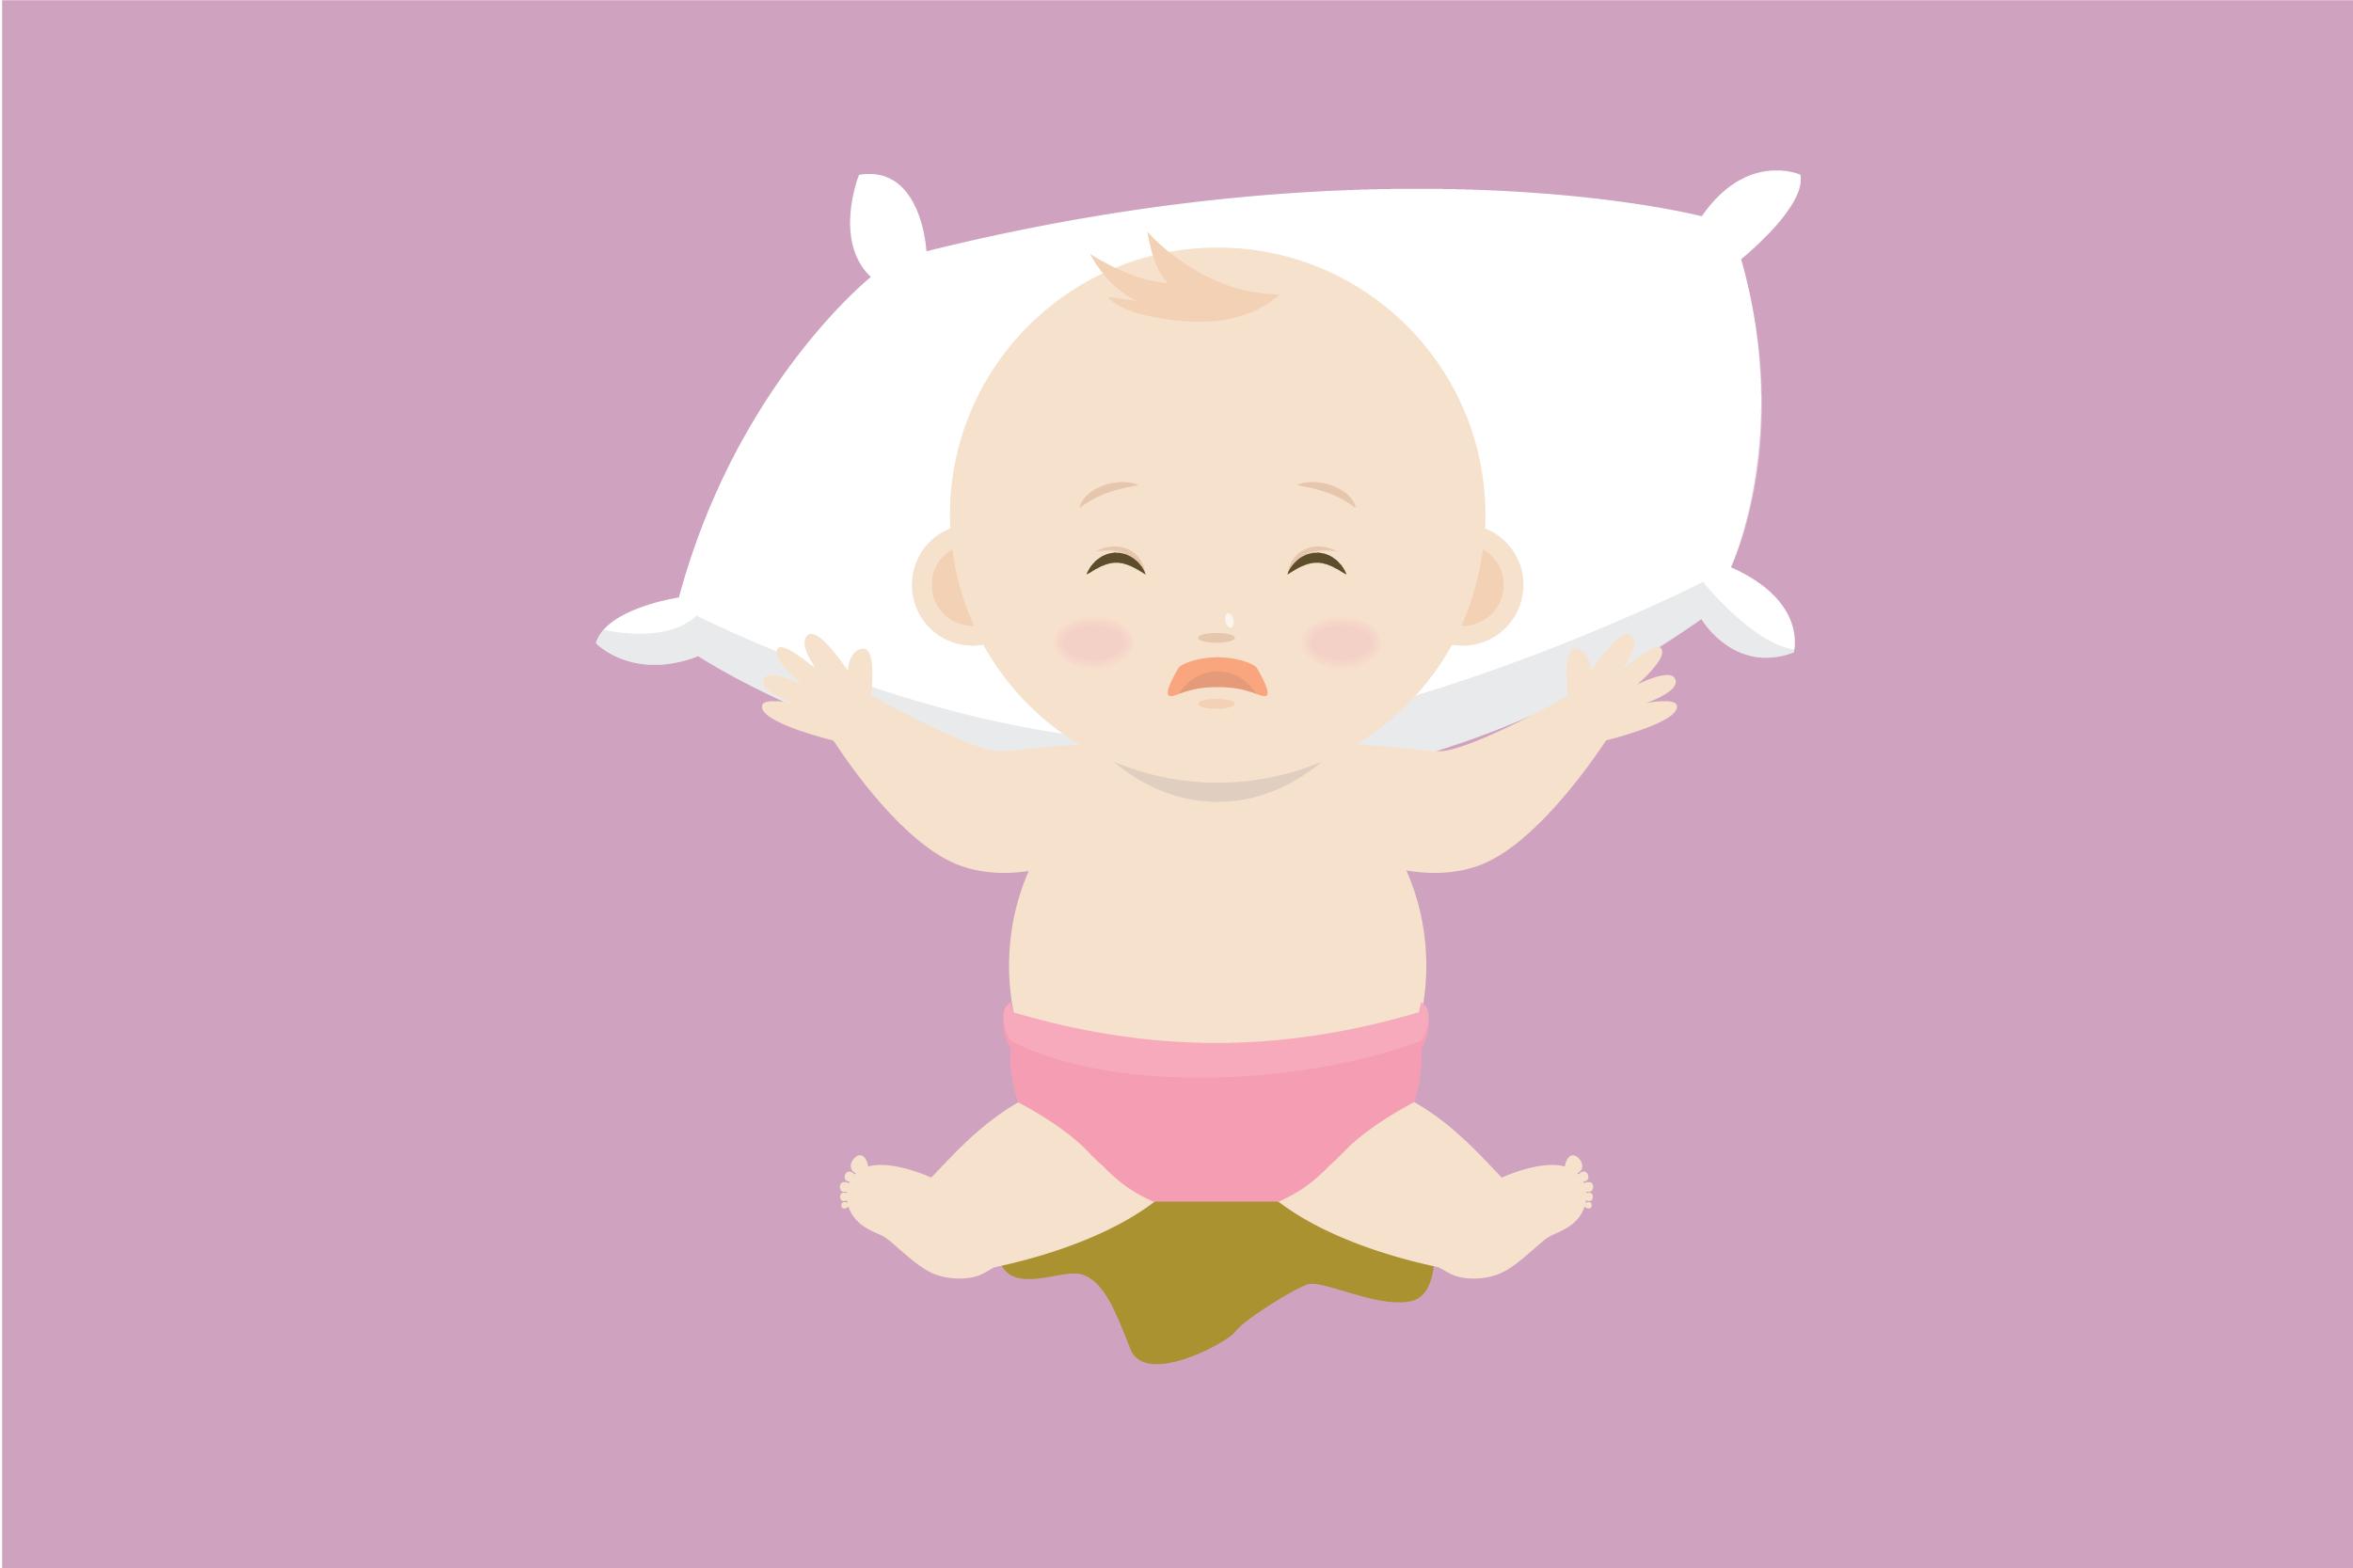 Bayi Baru Lahir Mencret Berbahayakah Janethes